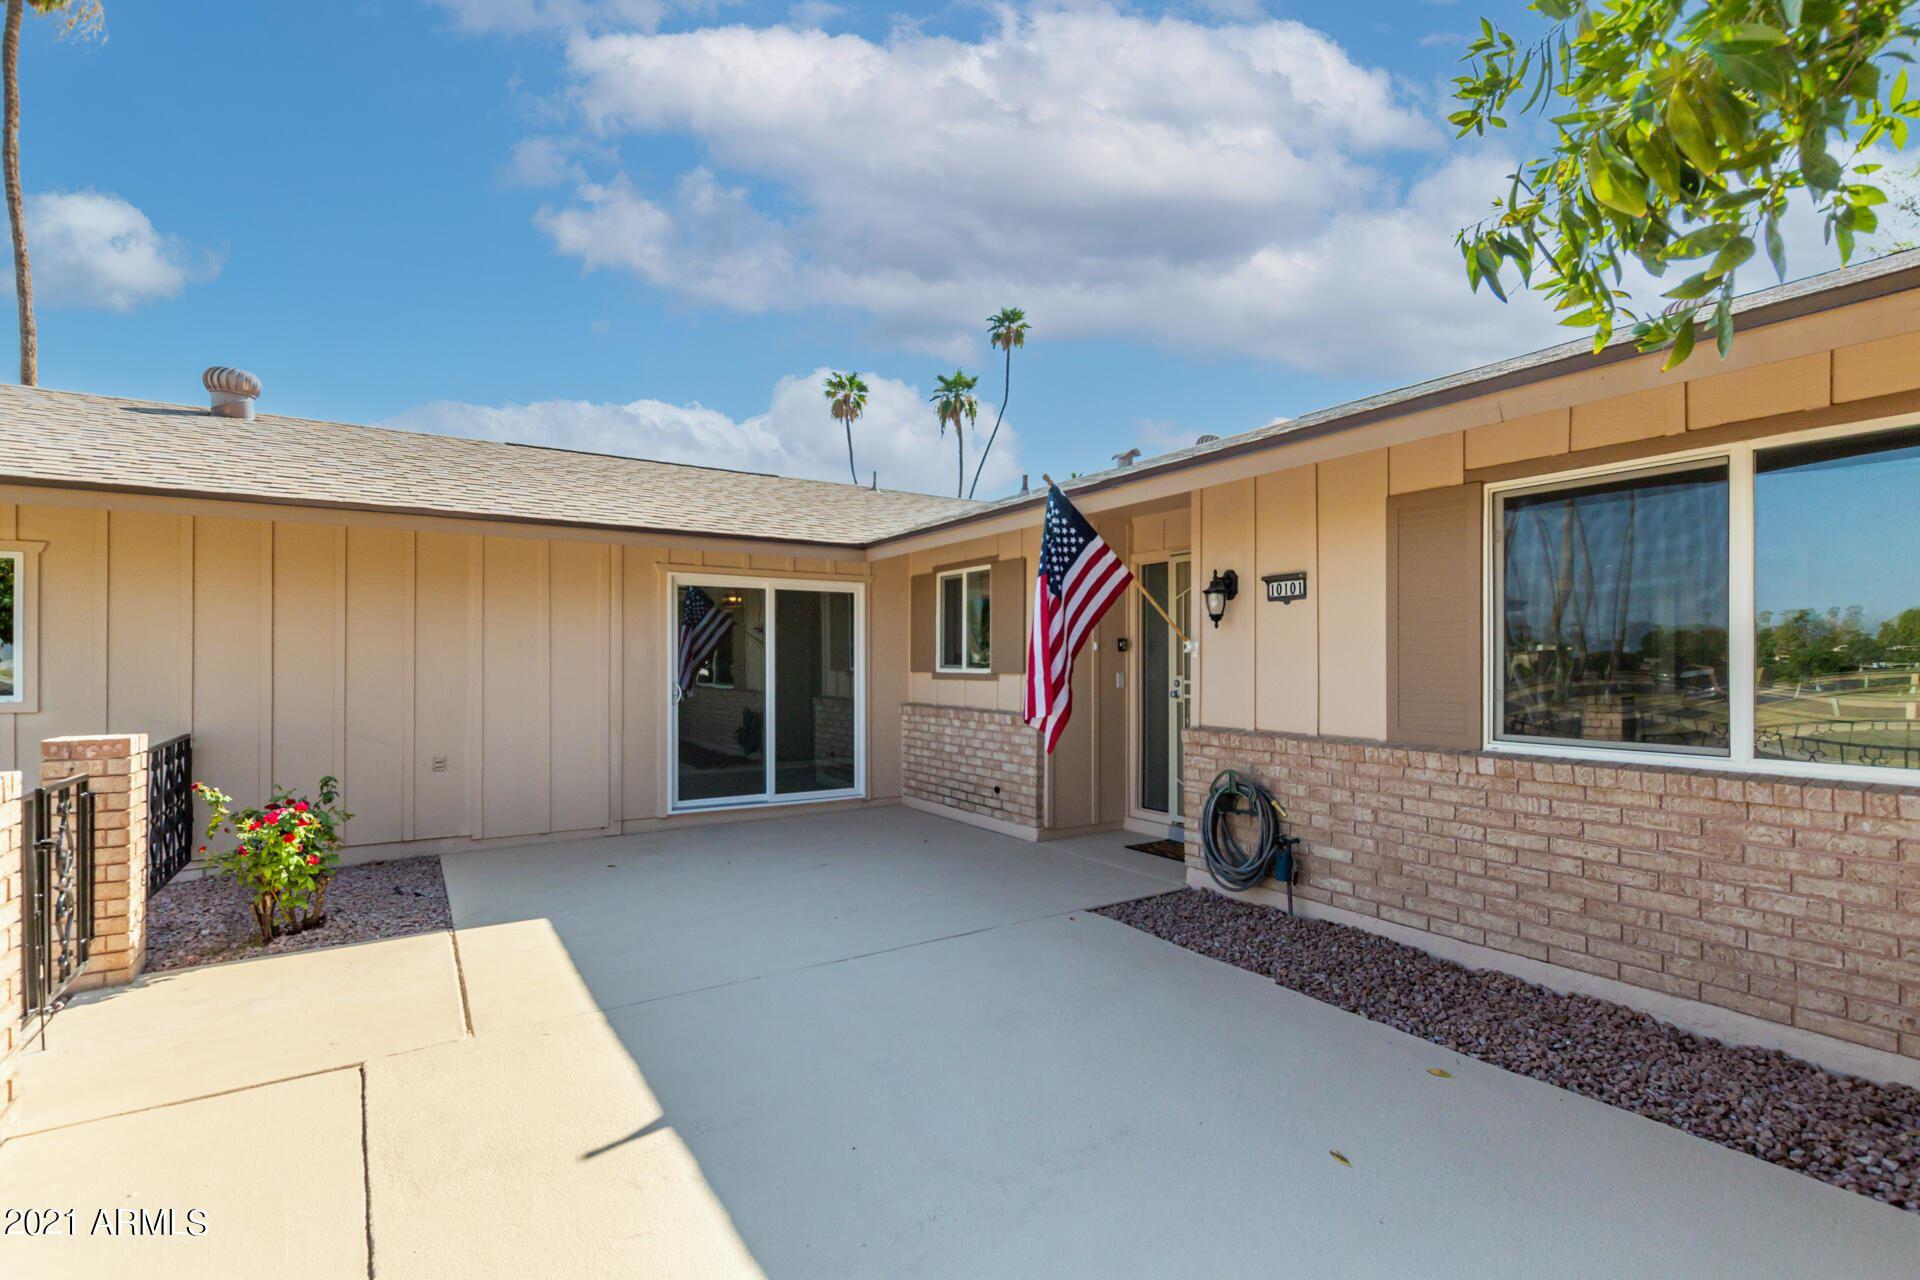 Photo of 10101 W CANDLEWOOD Drive, Sun City, AZ 85351 (MLS # 6295100)